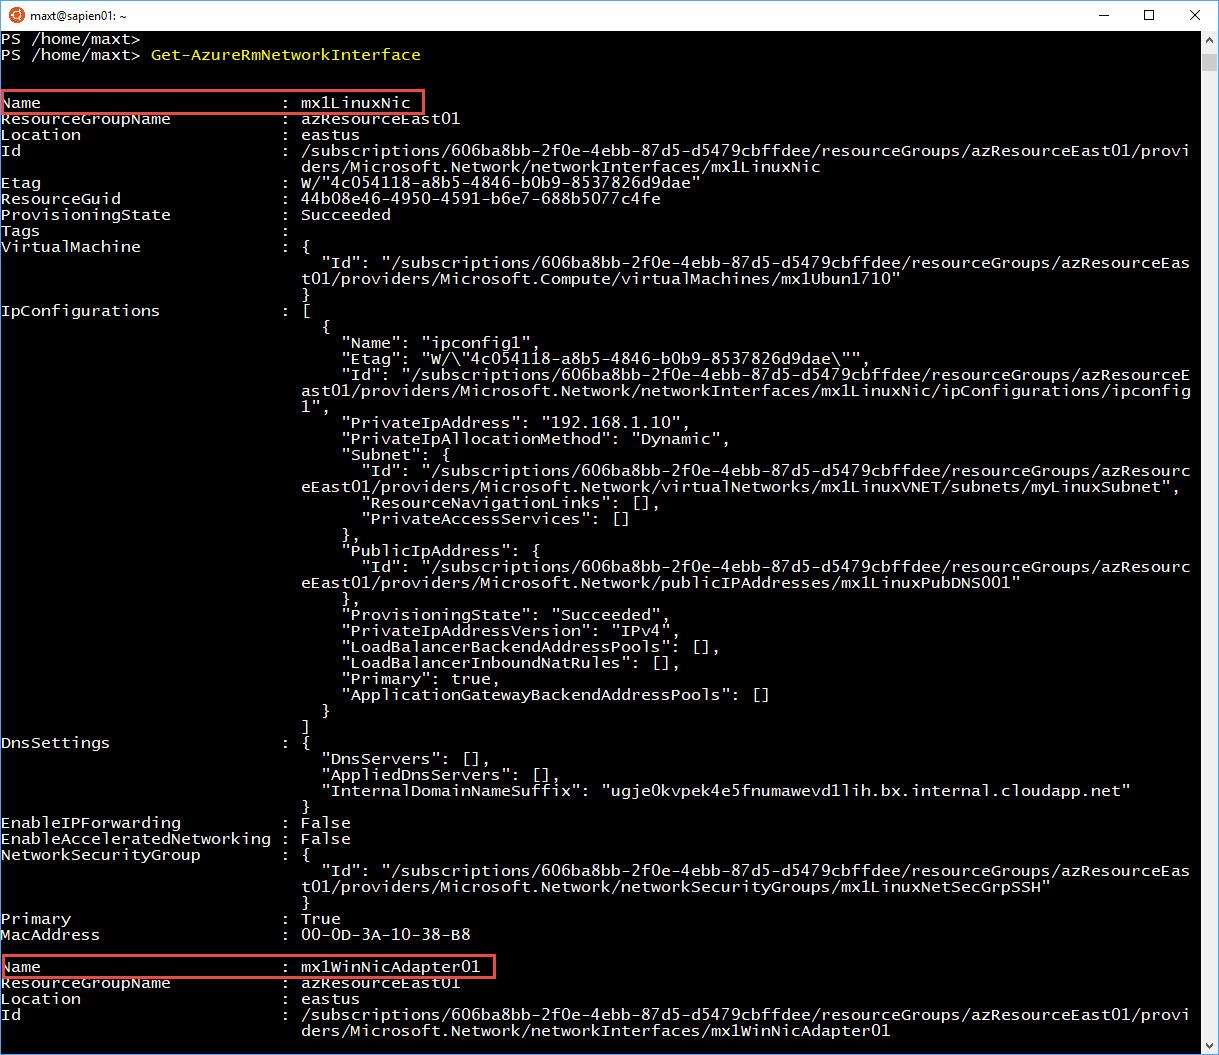 PowerShell Get-AzureRMNetworkInterface Customize View – Max